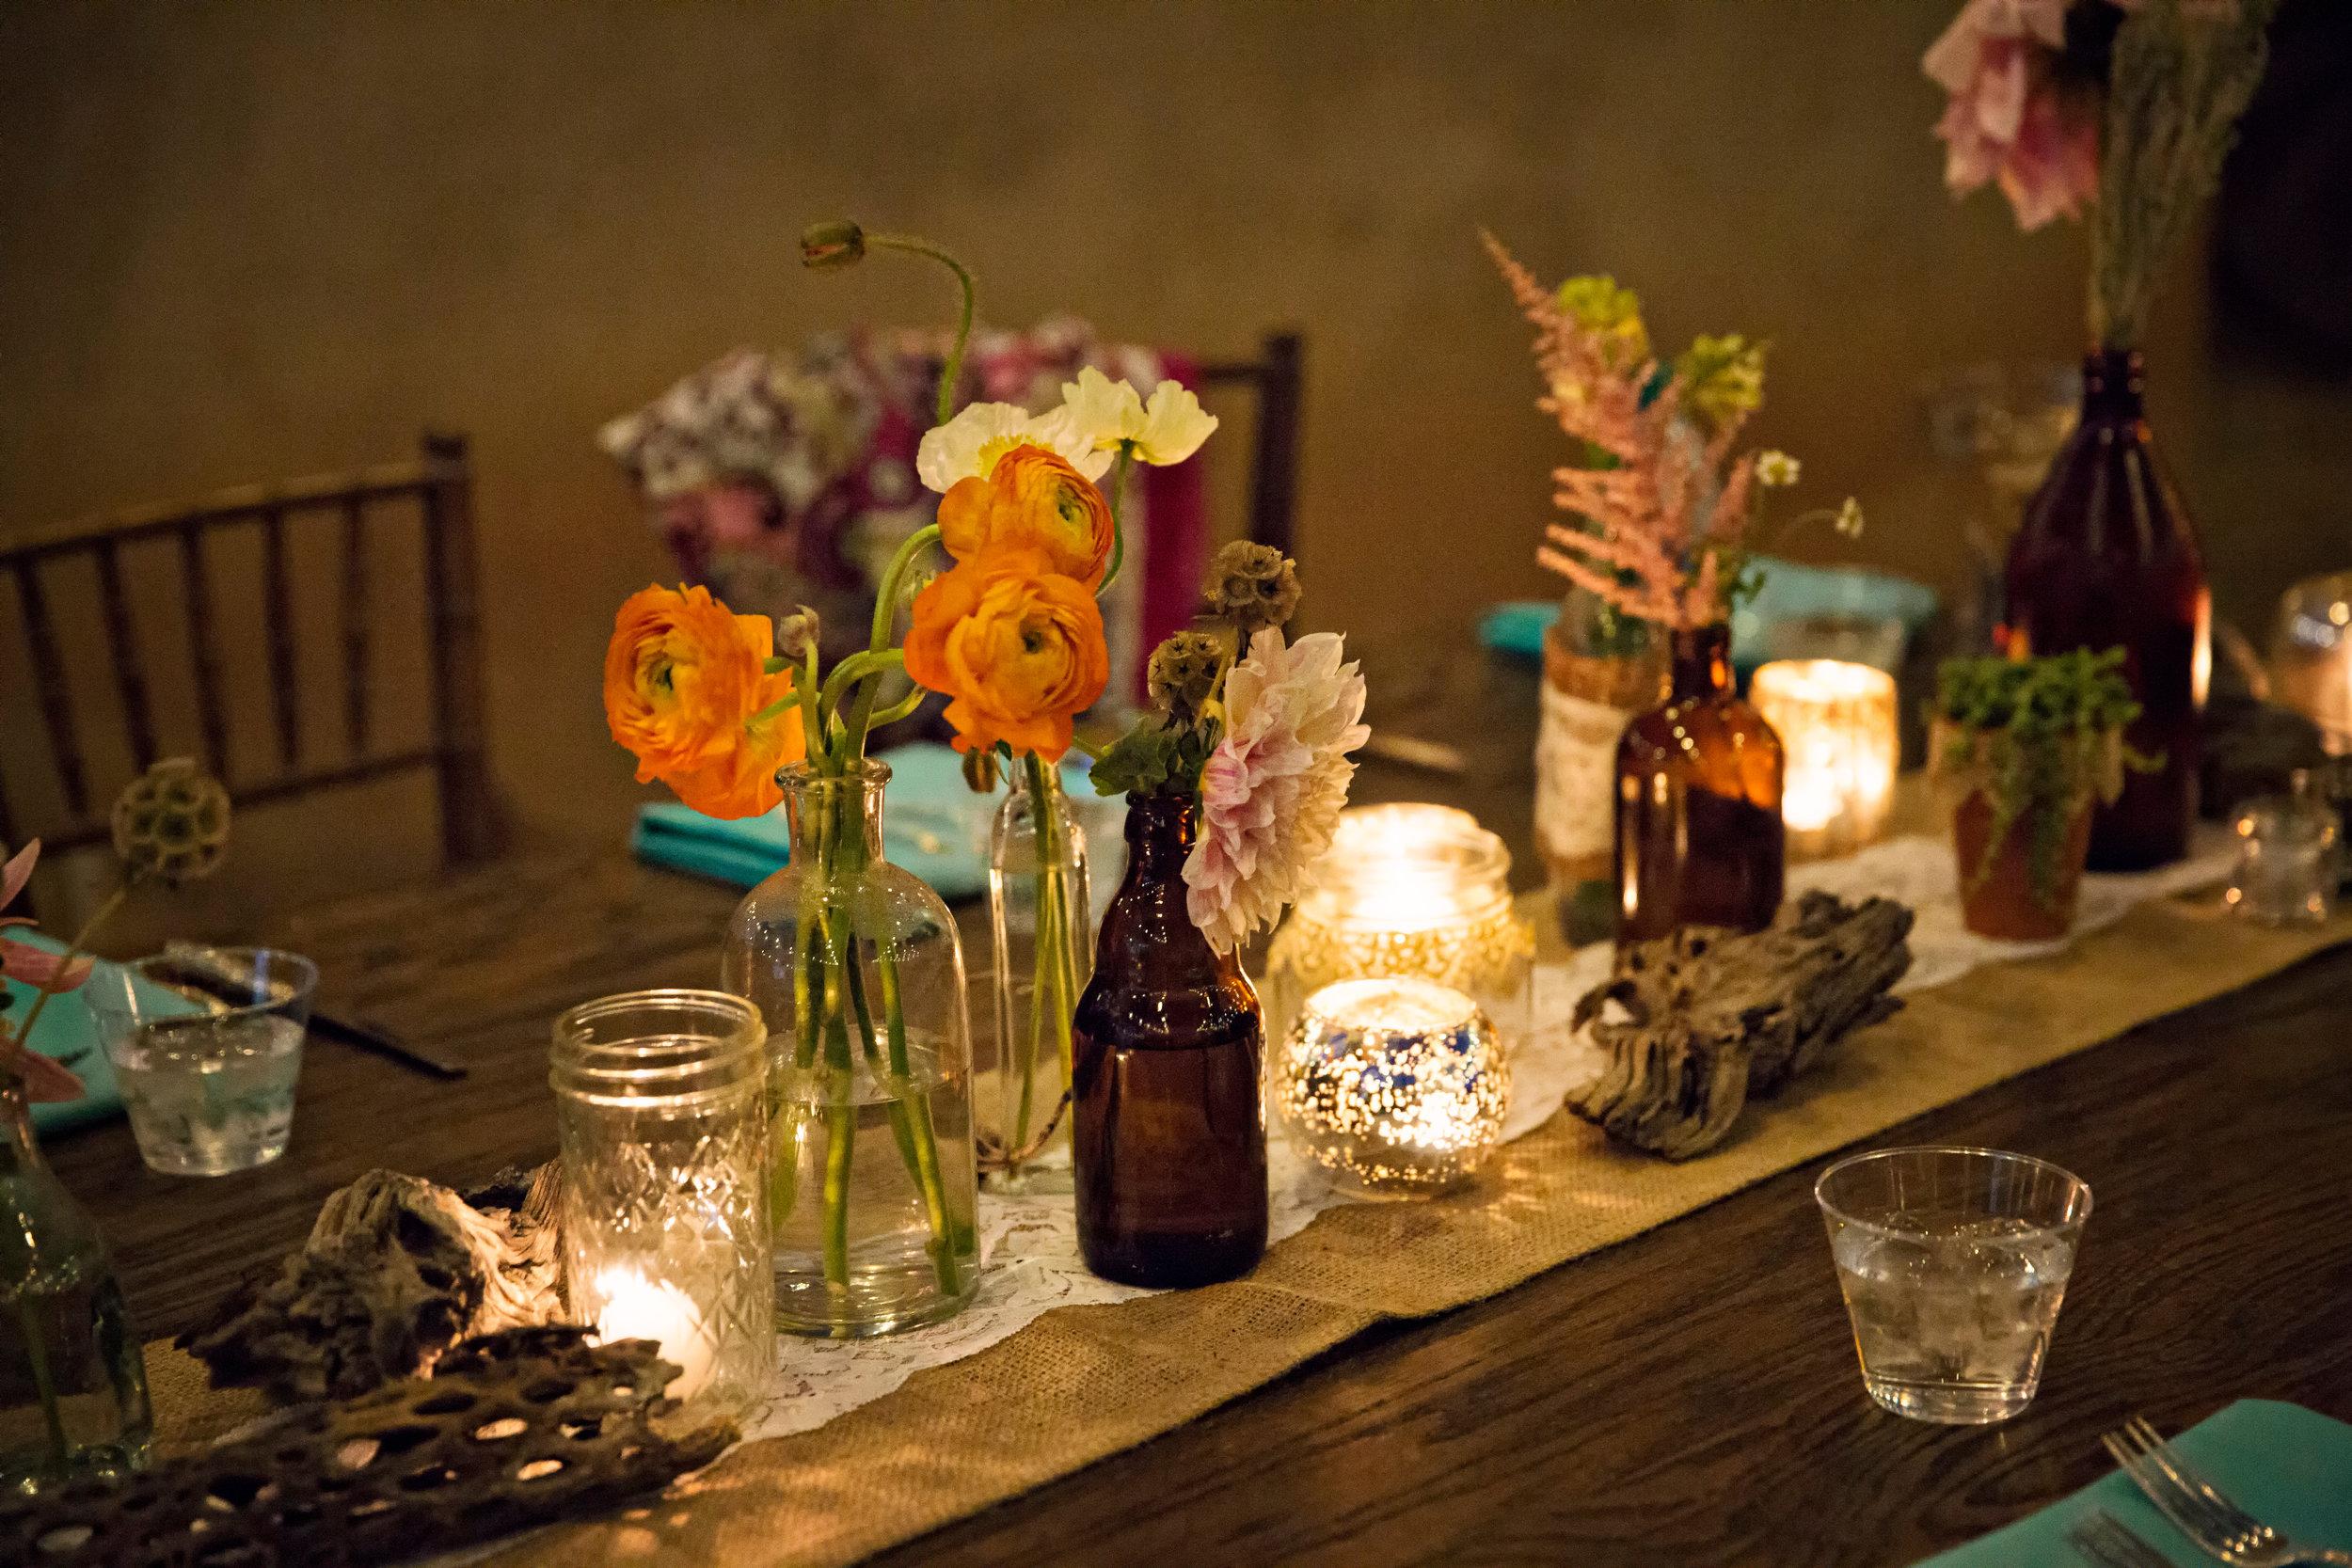 night table